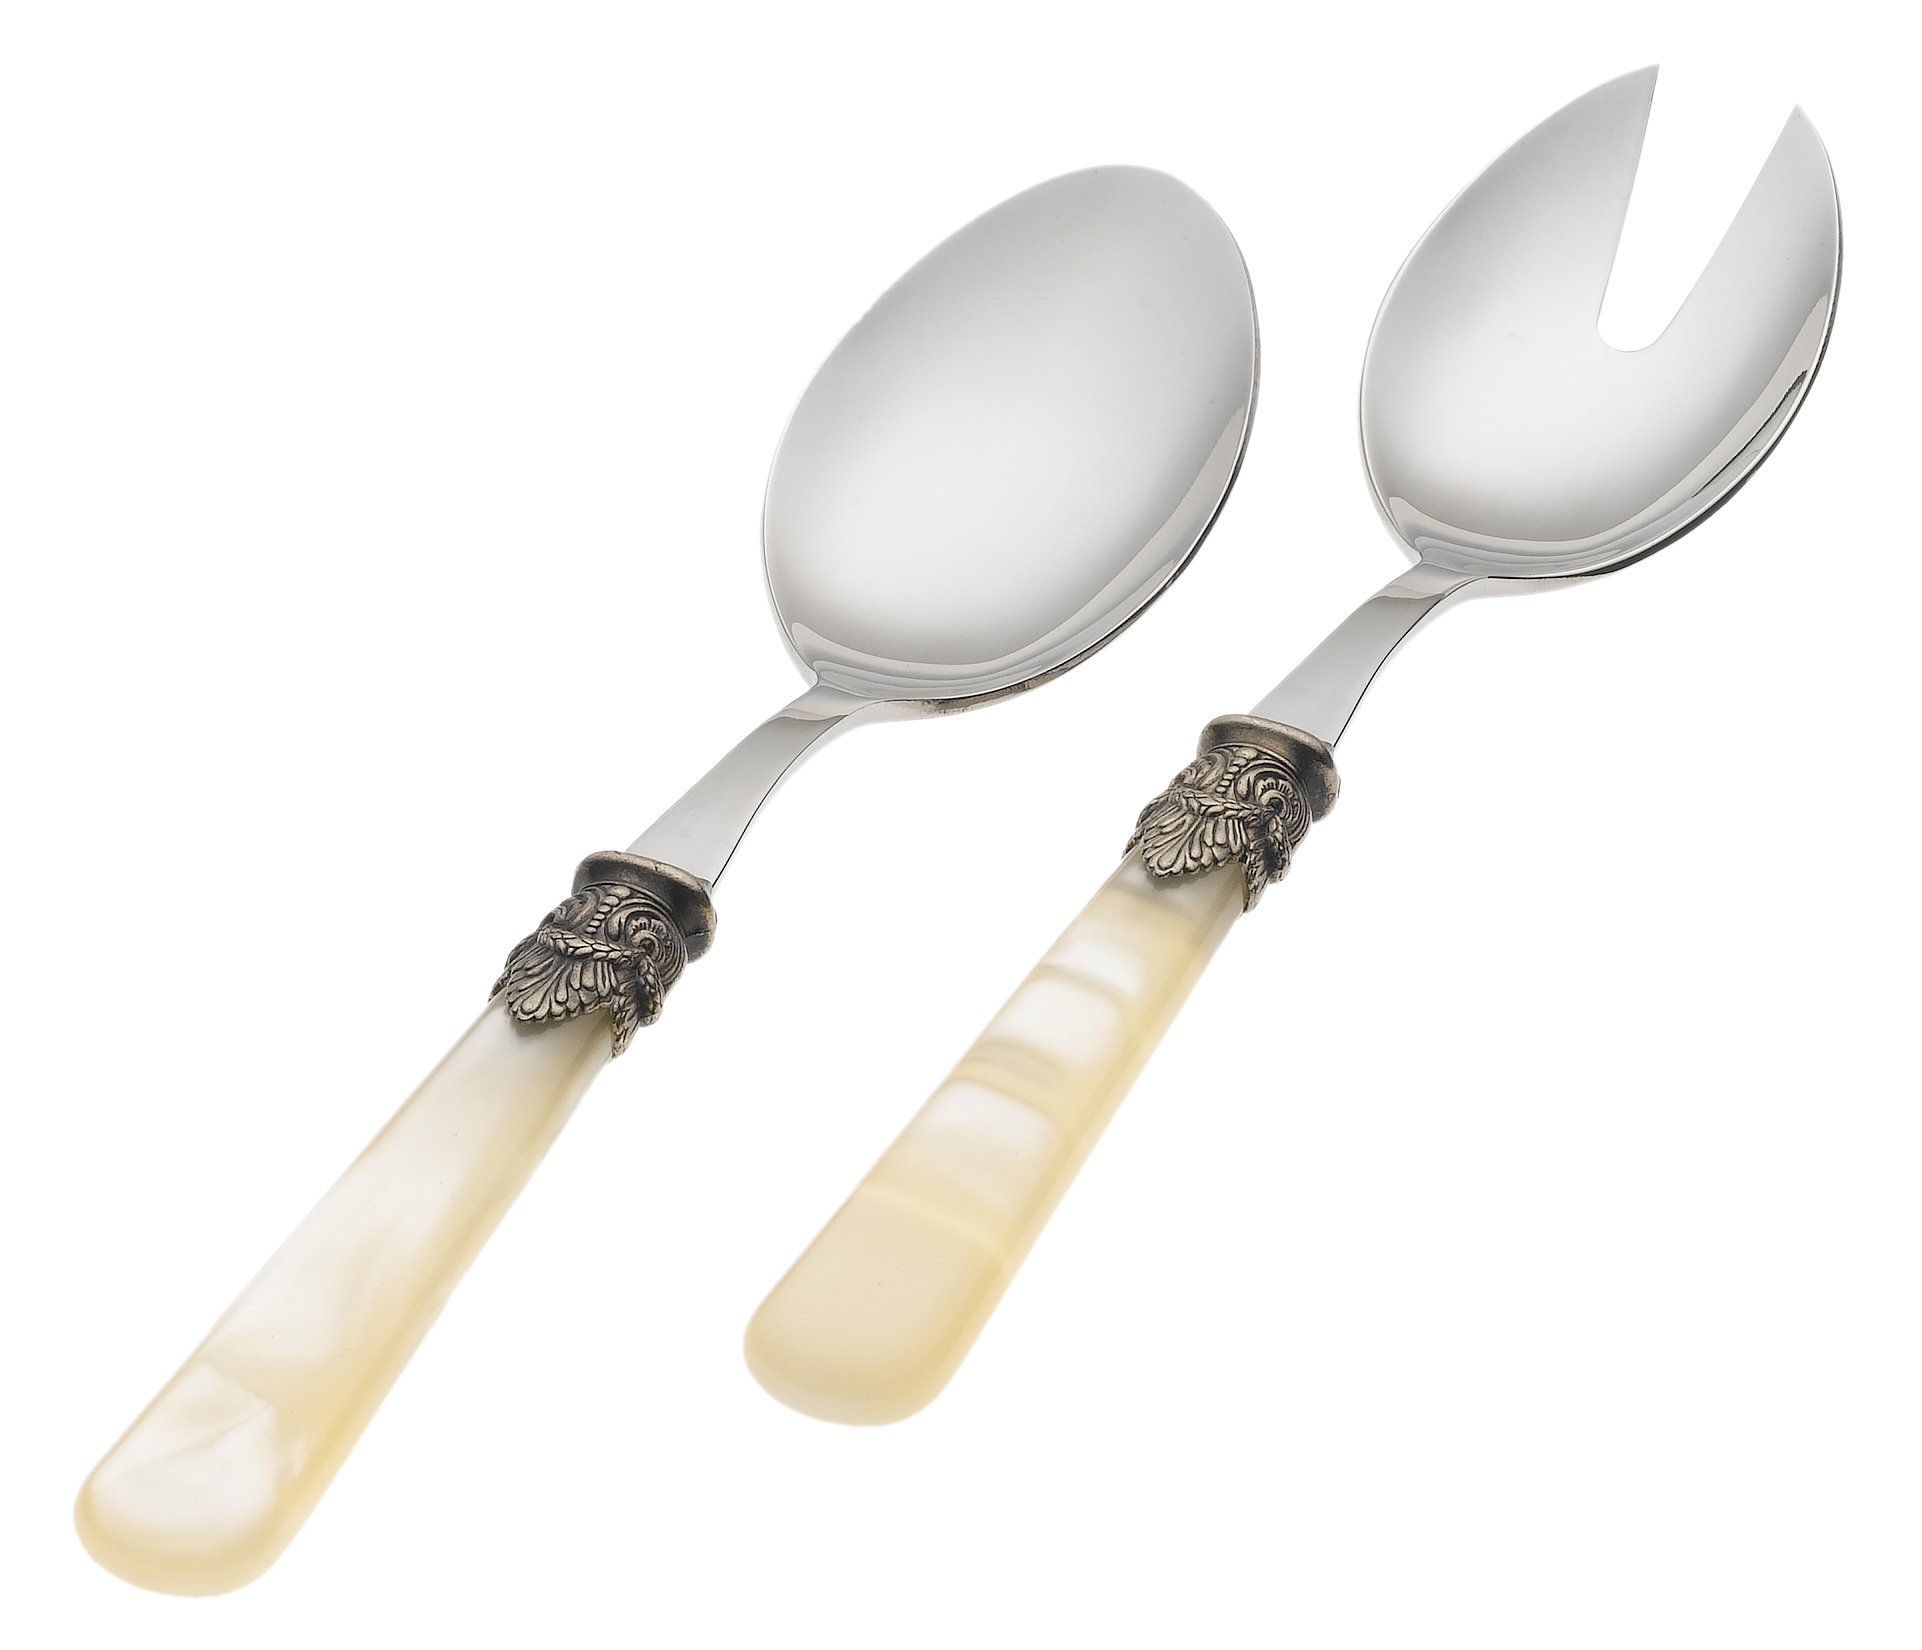 Rosanna Pearlized Ivory Napoleon 2-Piece Salad Tong Set